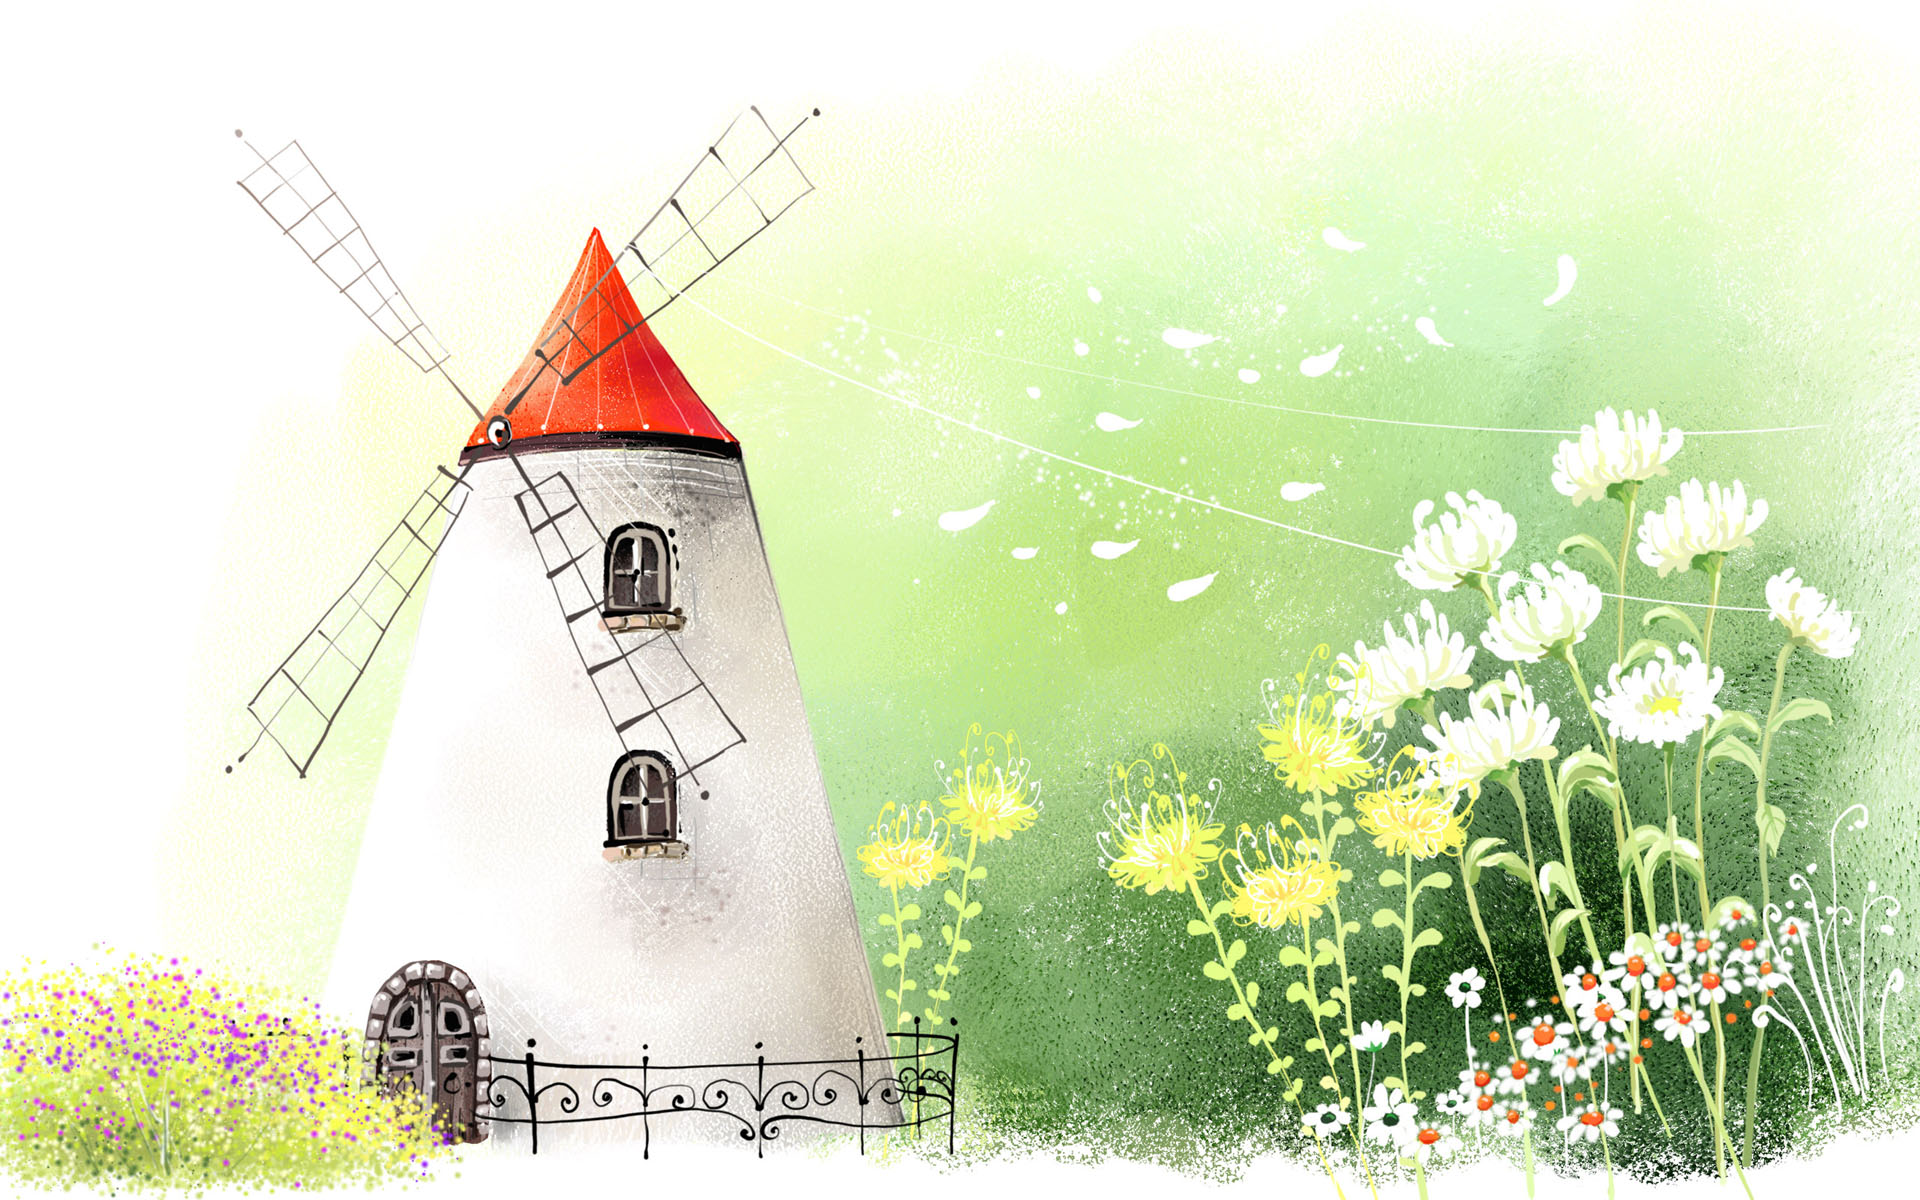 http://nevsepic.com.ua/uploads/posts/2011-09/1316876389_54_www.nevsepic.com.ua.jpg